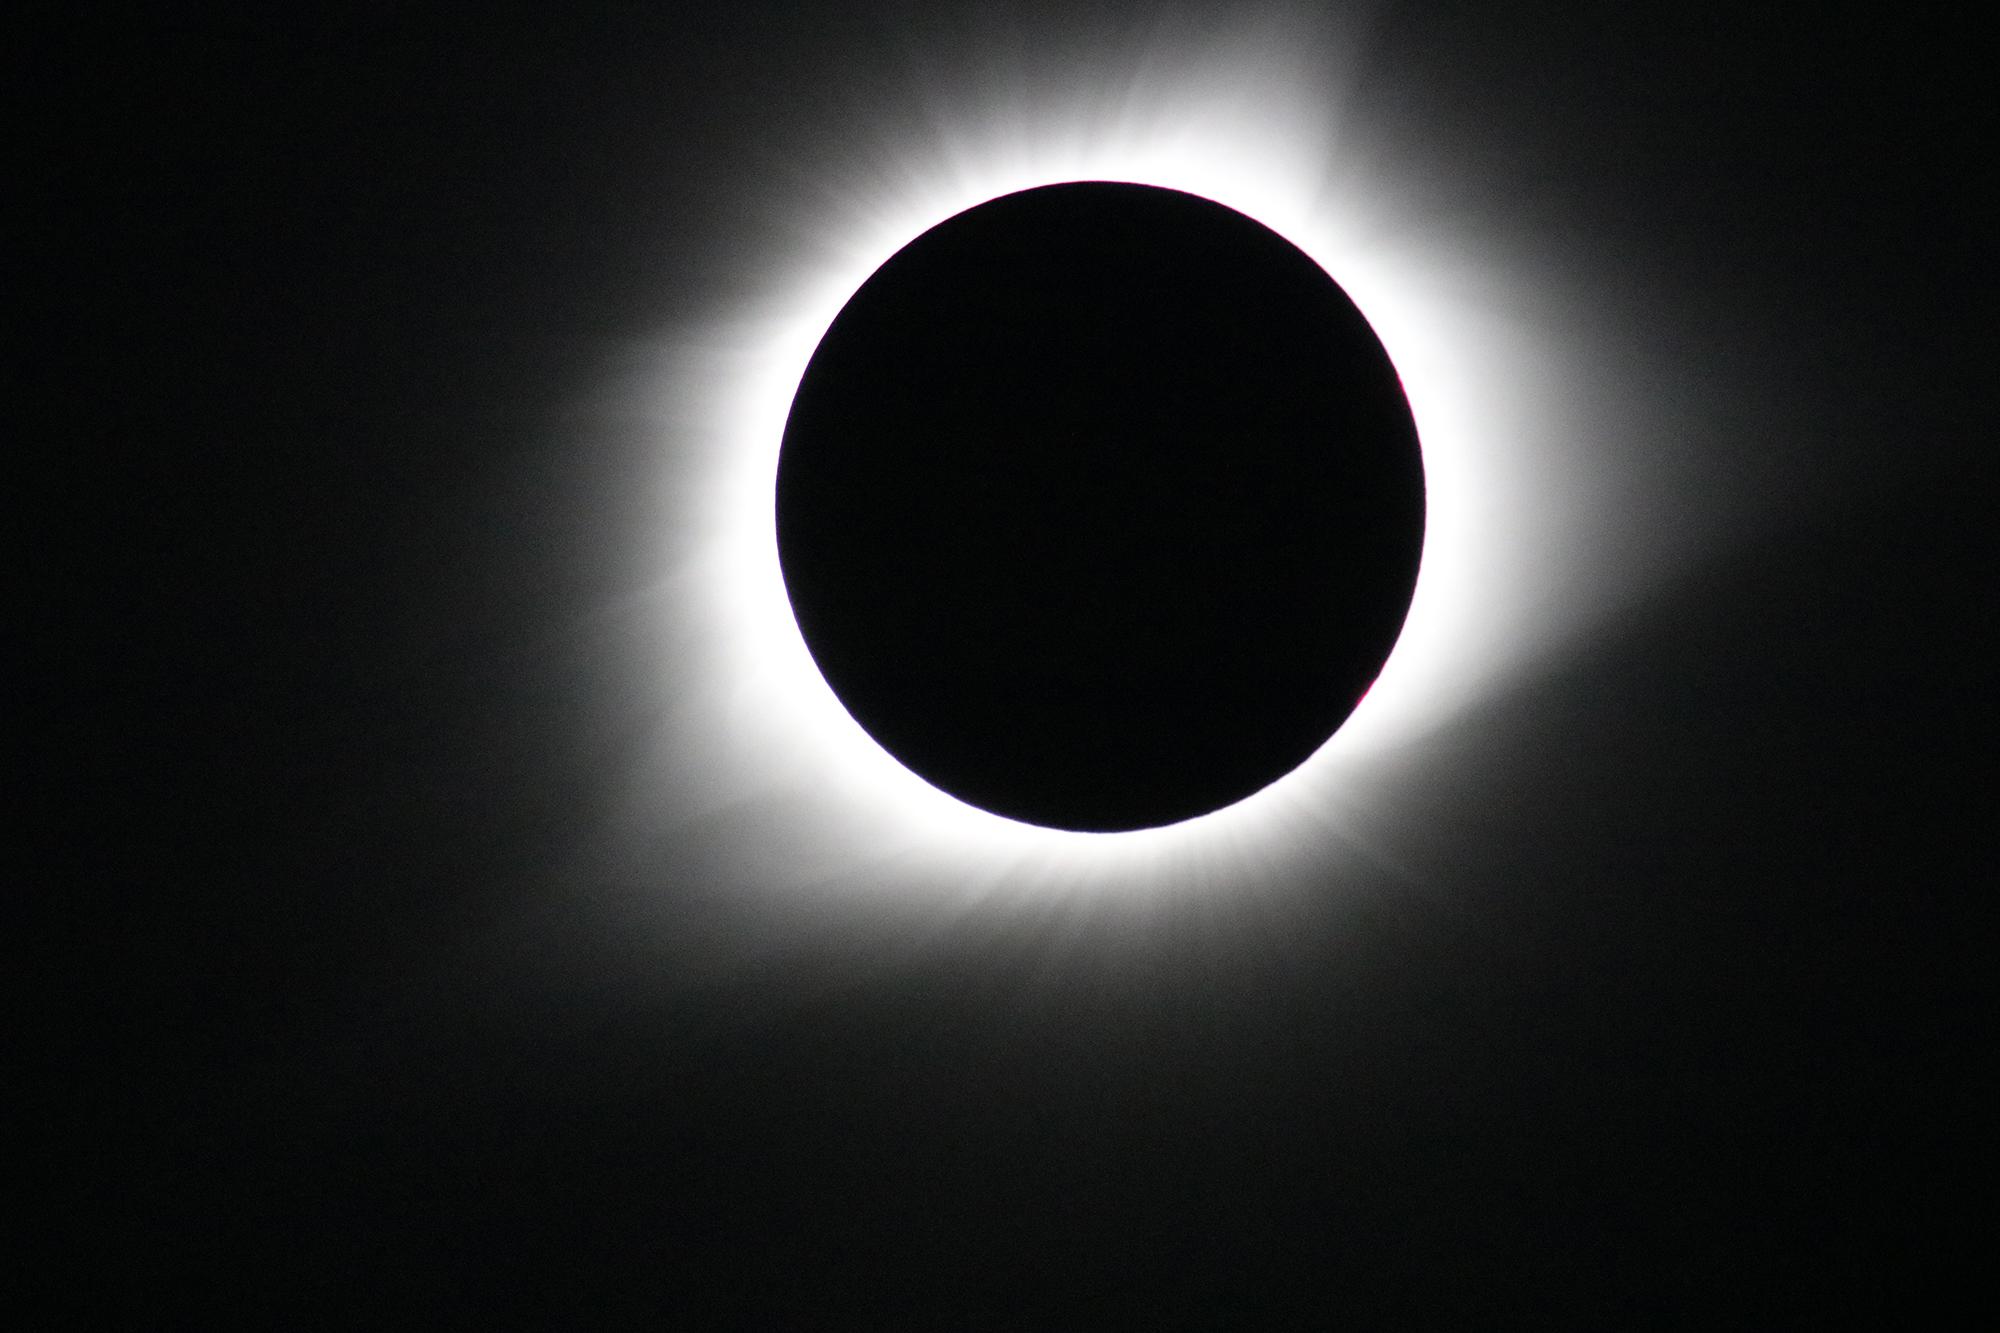 NASA Viz: 2017's All American Solar Eclipse |Total Solar Eclipse From Nasa